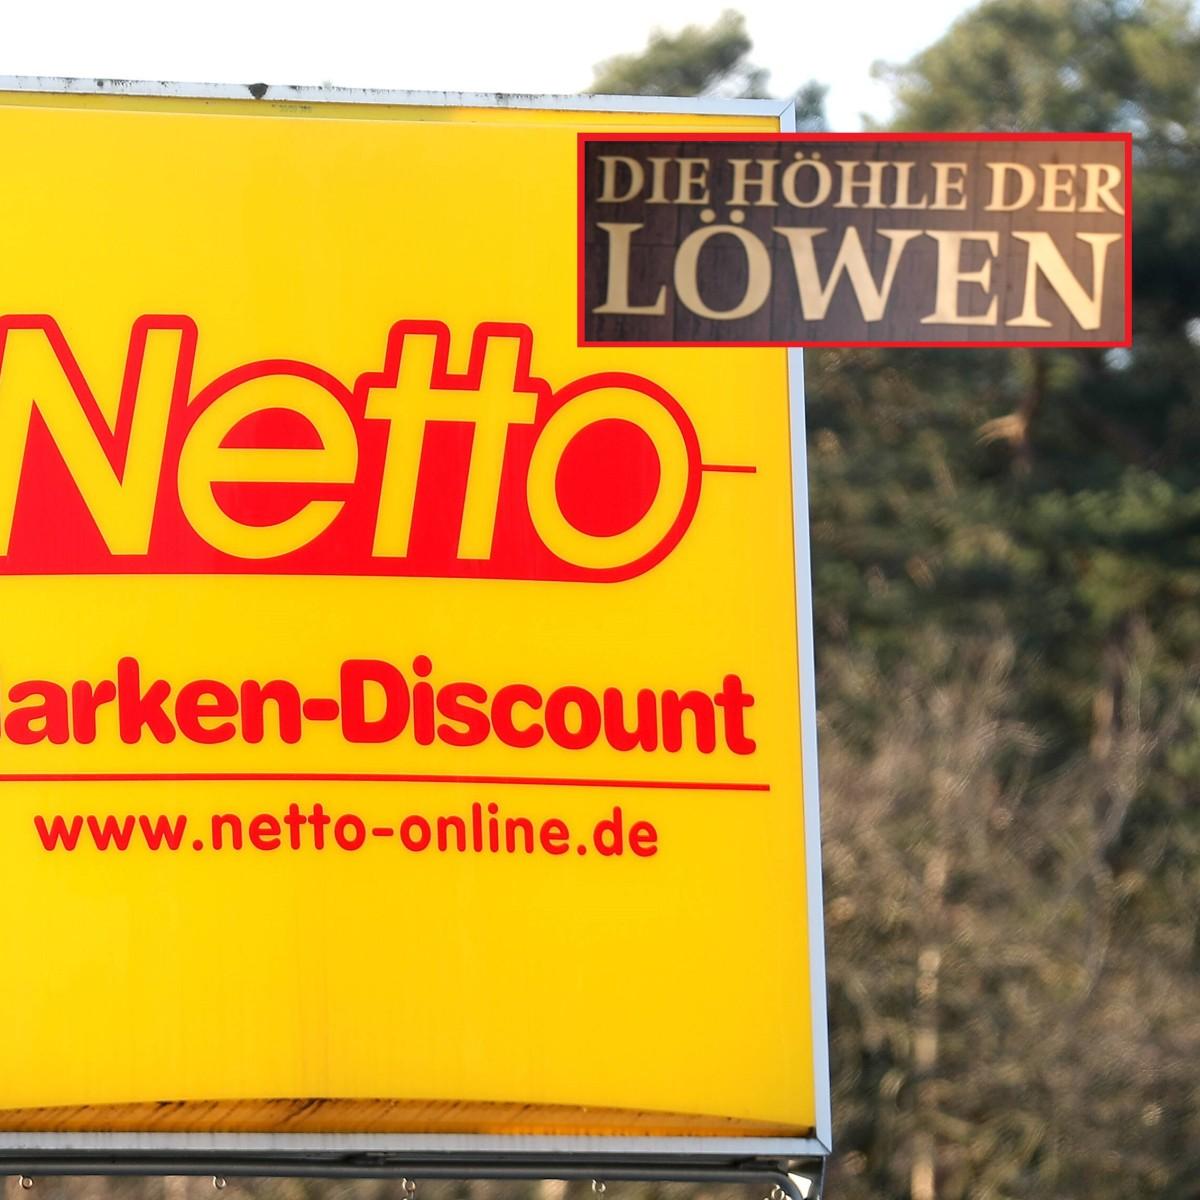 Netto Marken Discount Stiftung Bewerbung